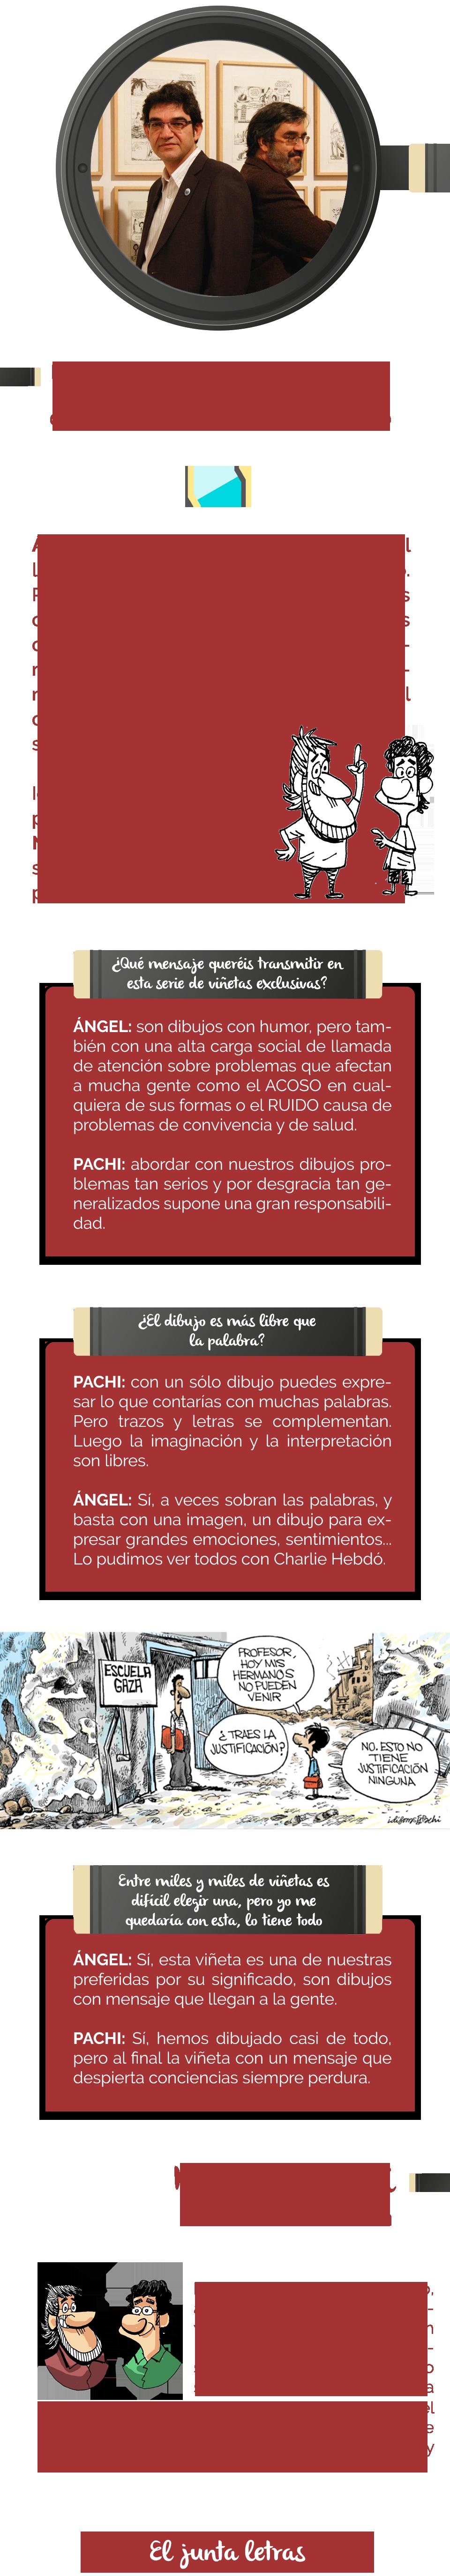 nanoentrevista_idigoras_pachi